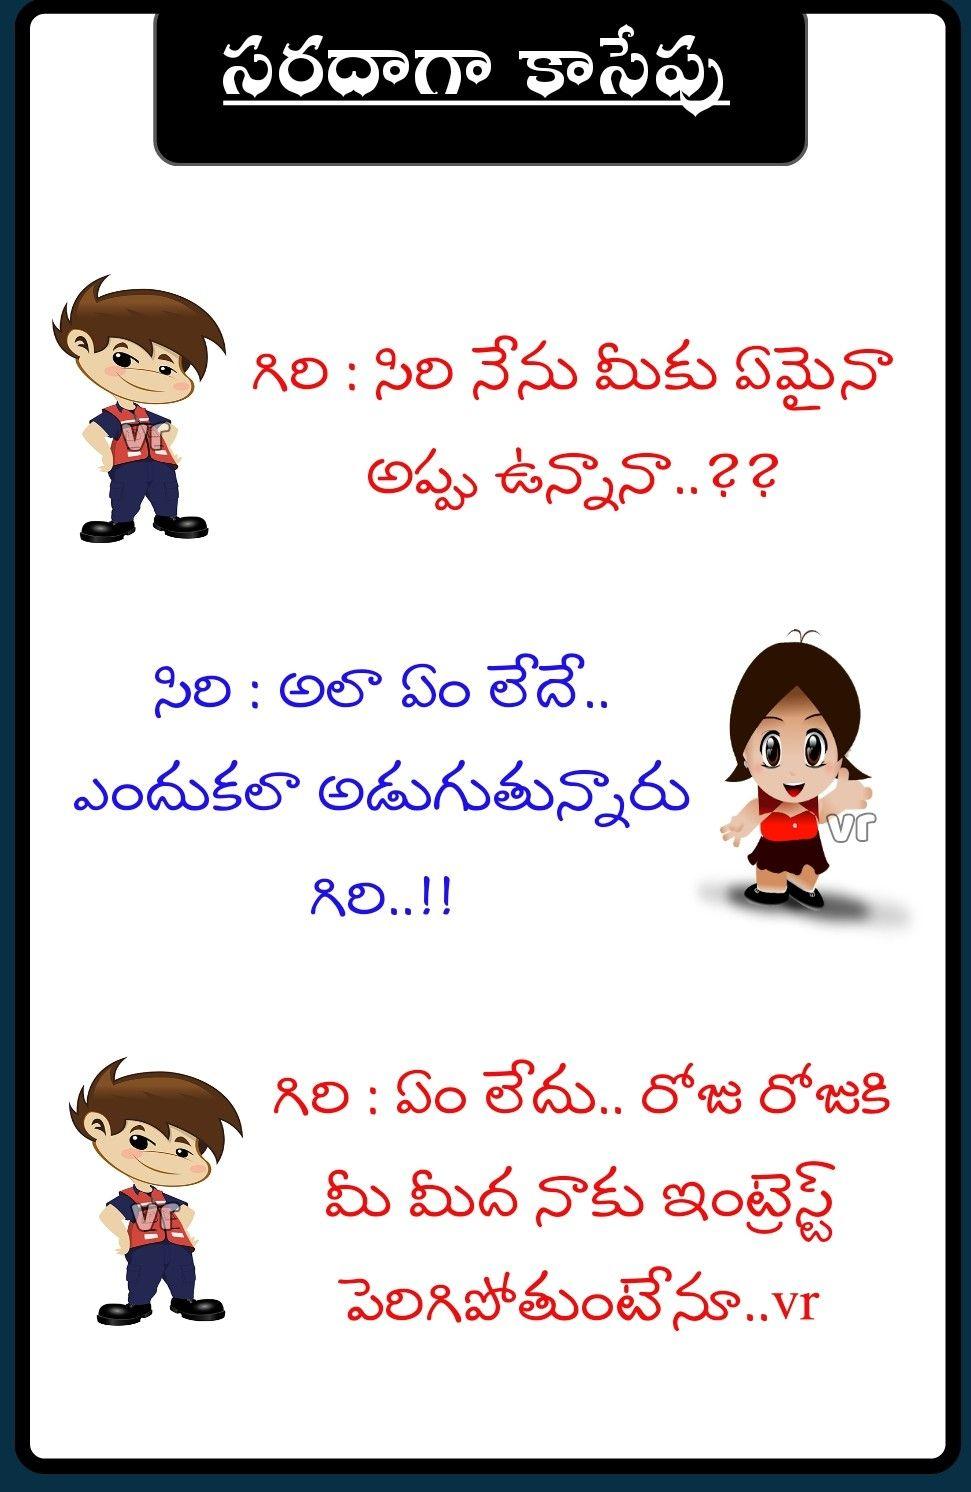 Pin by Raghavendra Murari on Butterflies Telugu jokes